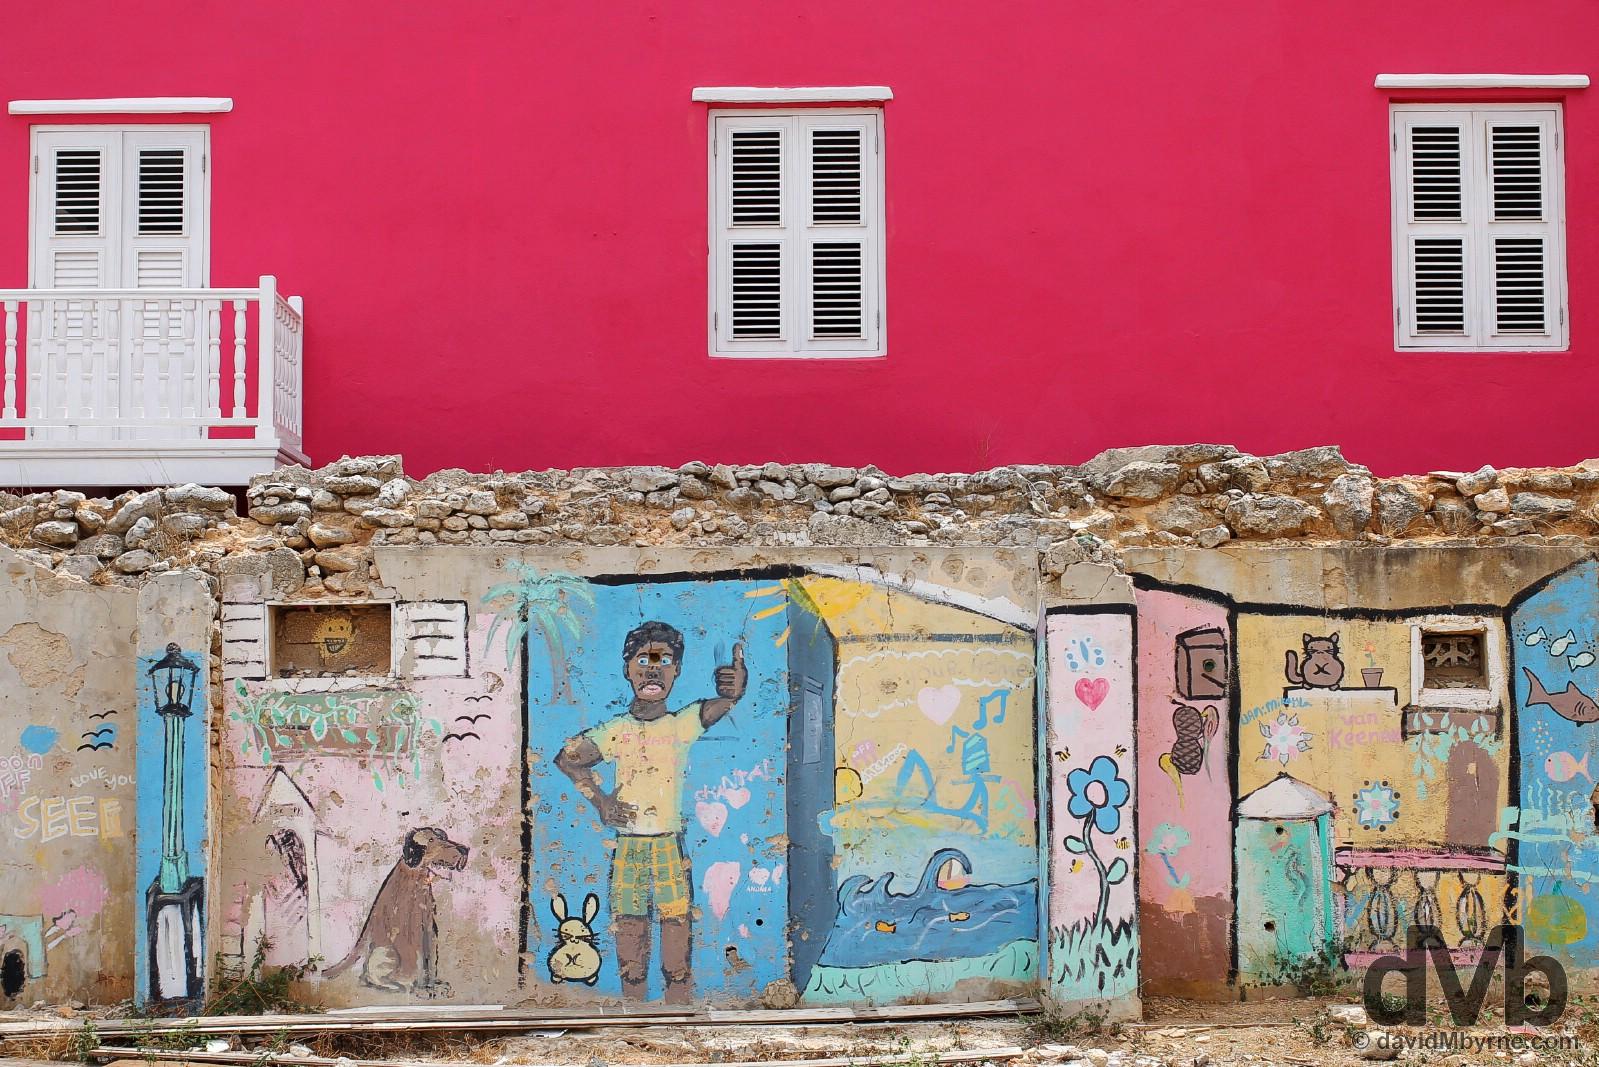 Otrobanda, Willemstad, Curacao, Lesser Antilles. June 19, 2015.